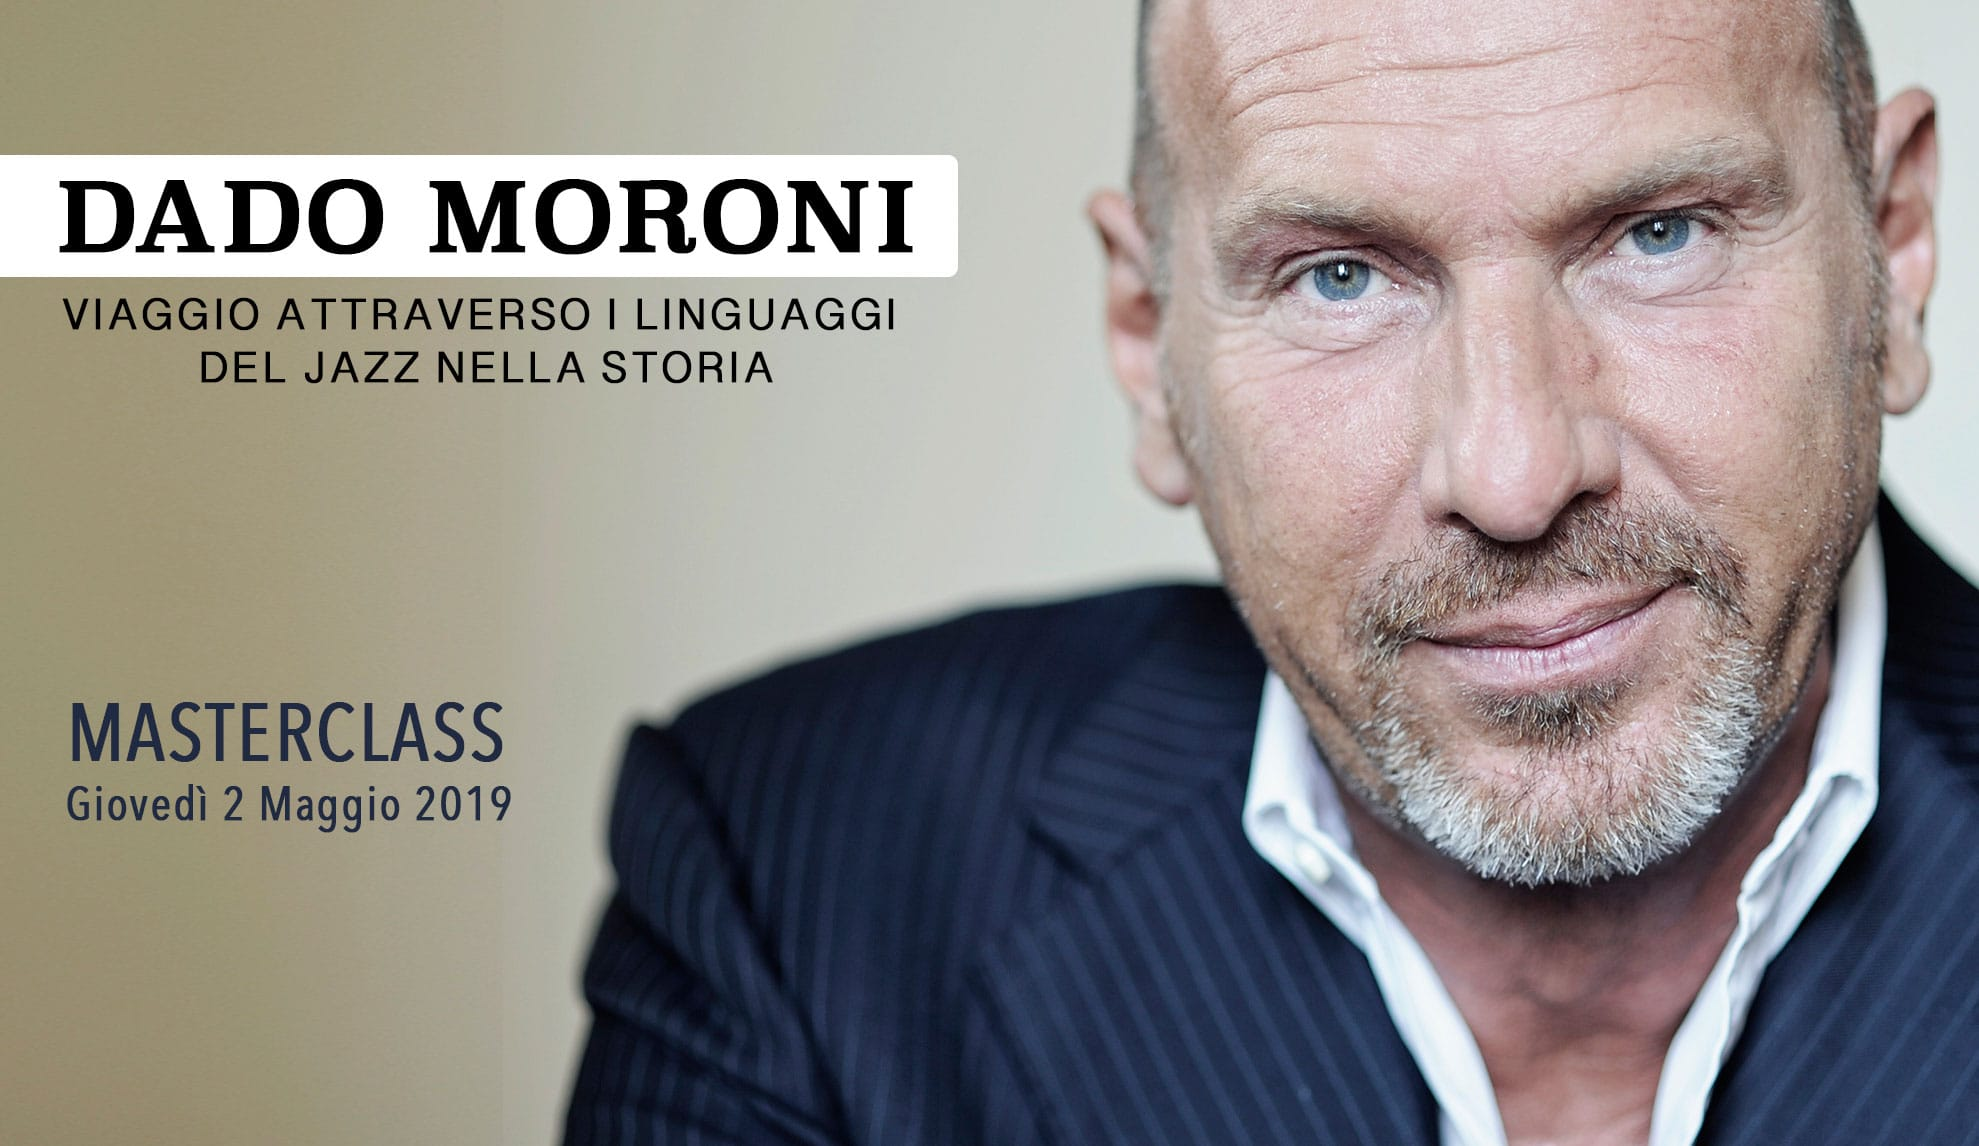 Dado-moroni-master-class